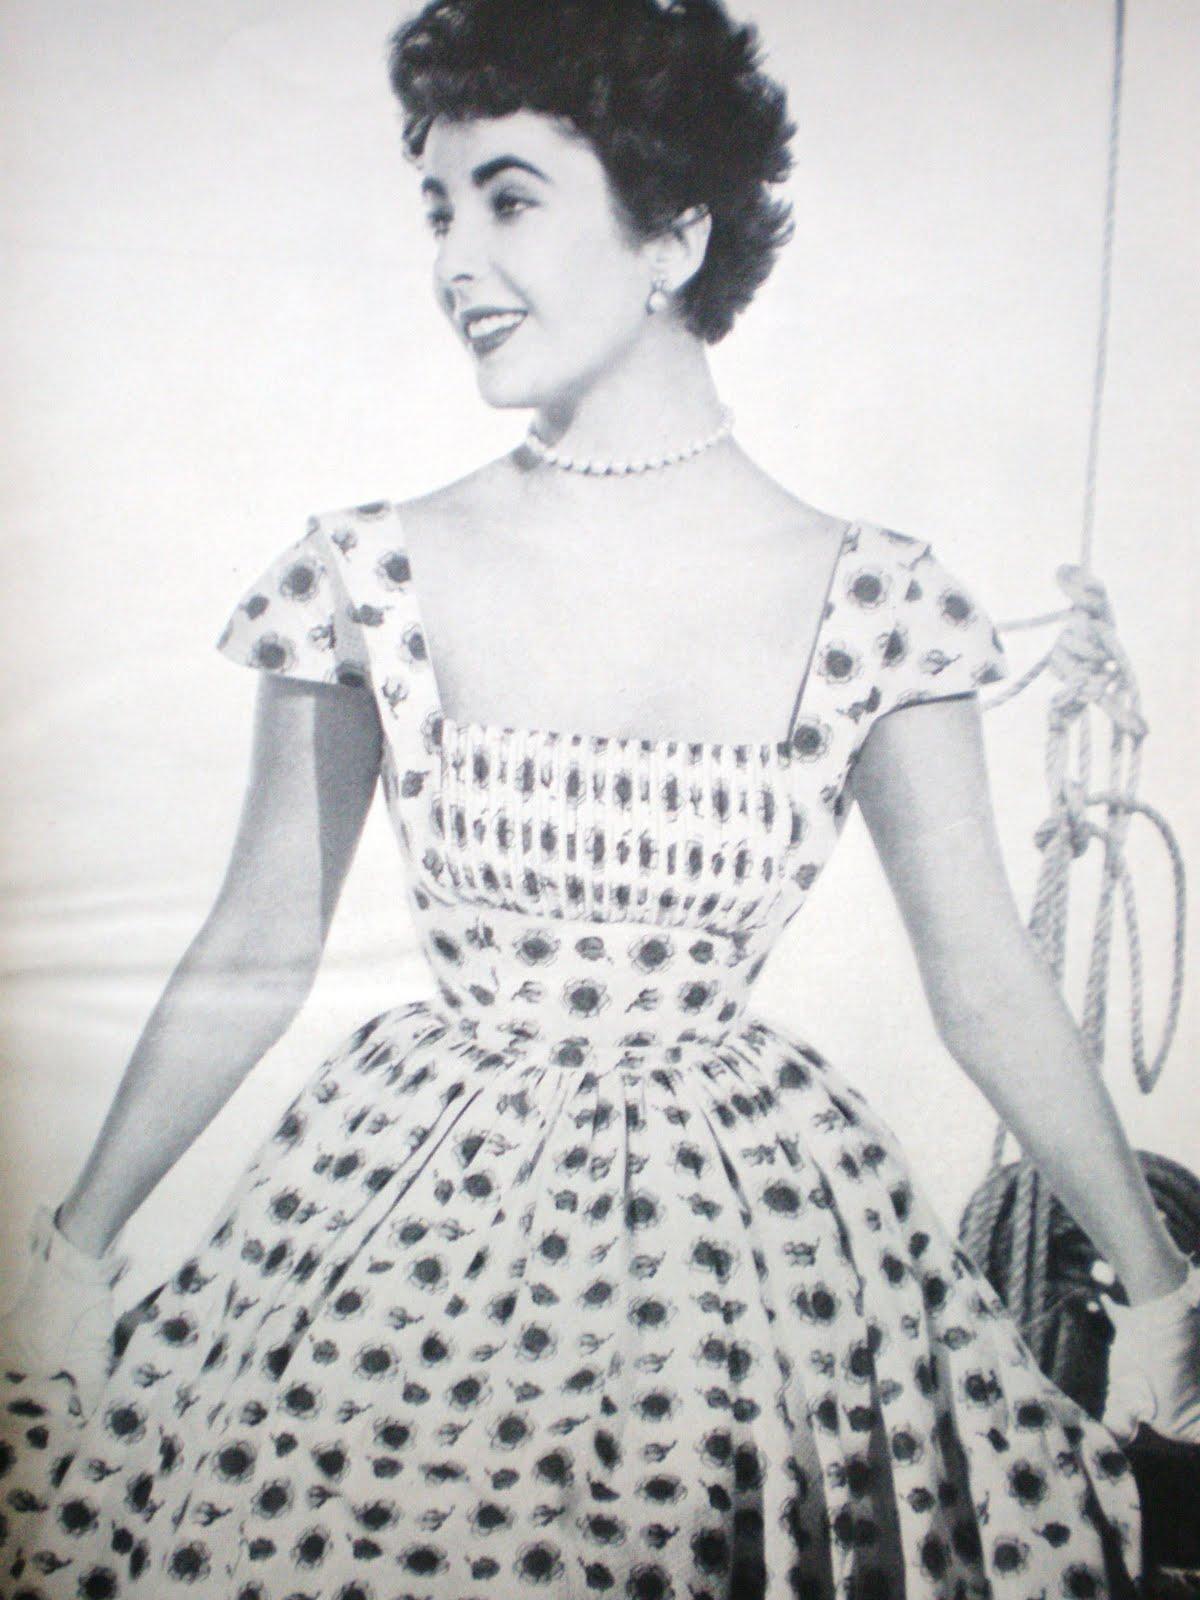 219a80d4f297 1950 s Vintage Dress Styles  Sew Summer Dresses Now! Liz Taylor